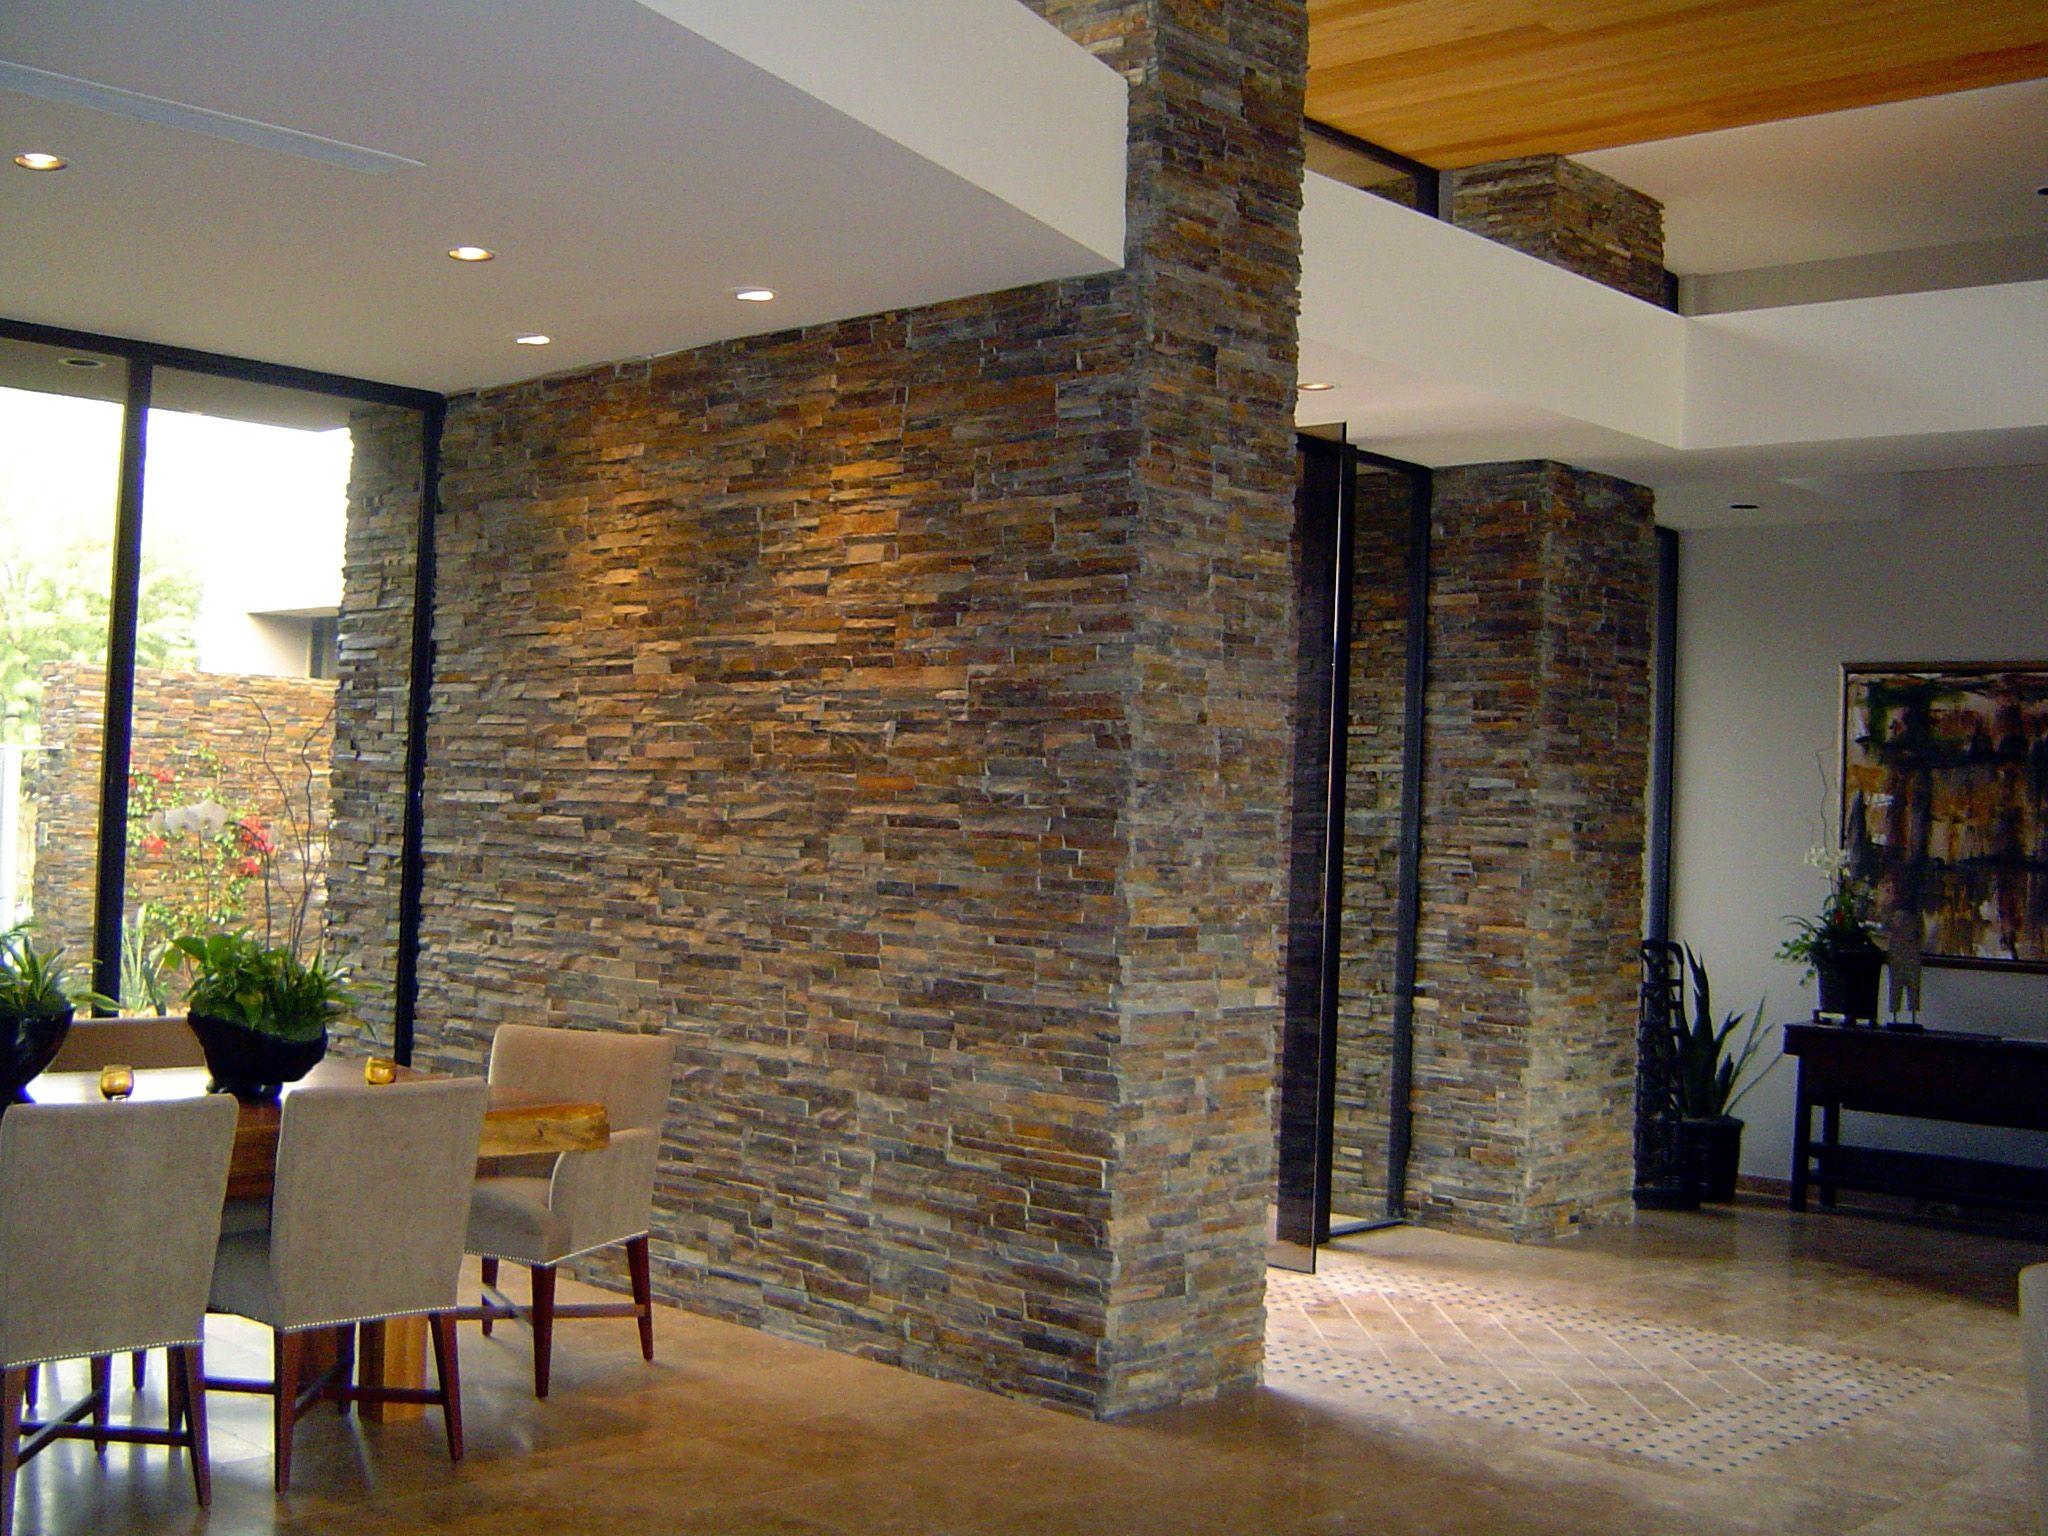 Estupendo sal n decorado con paneles premontados de piedra natural stonepanel sala wall - Paneles de piedra natural ...